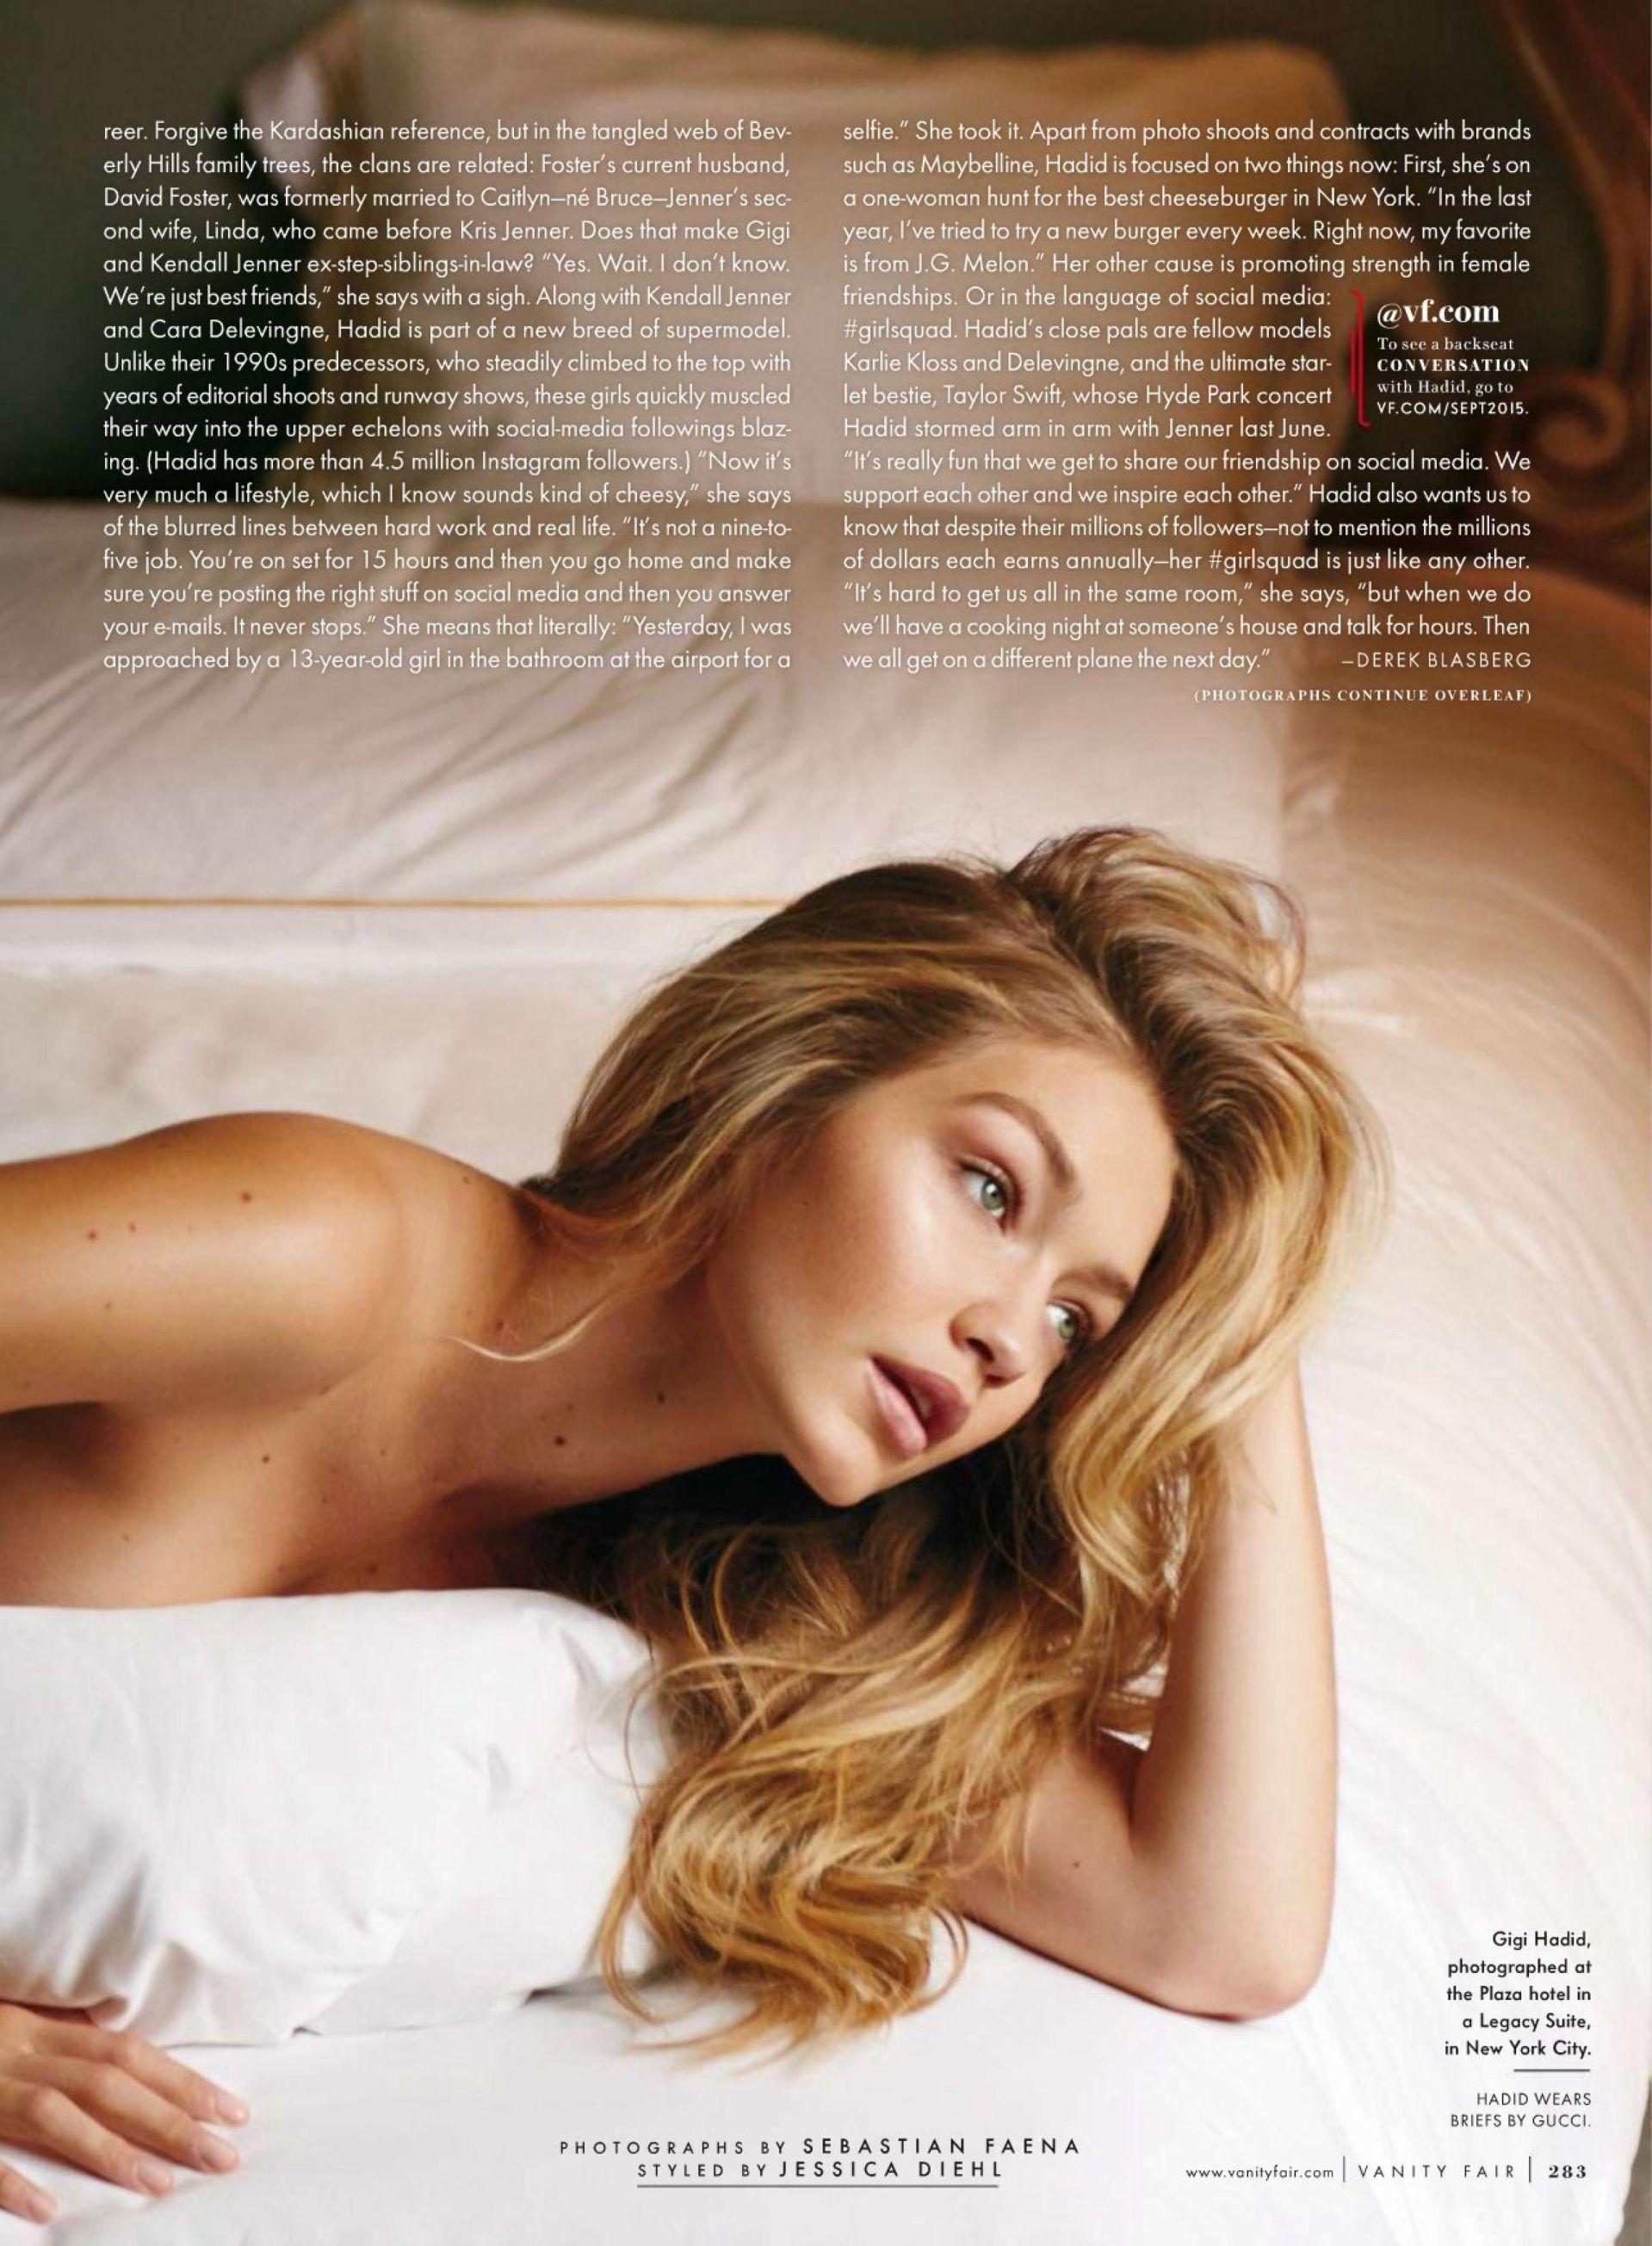 Gigi hadid topless